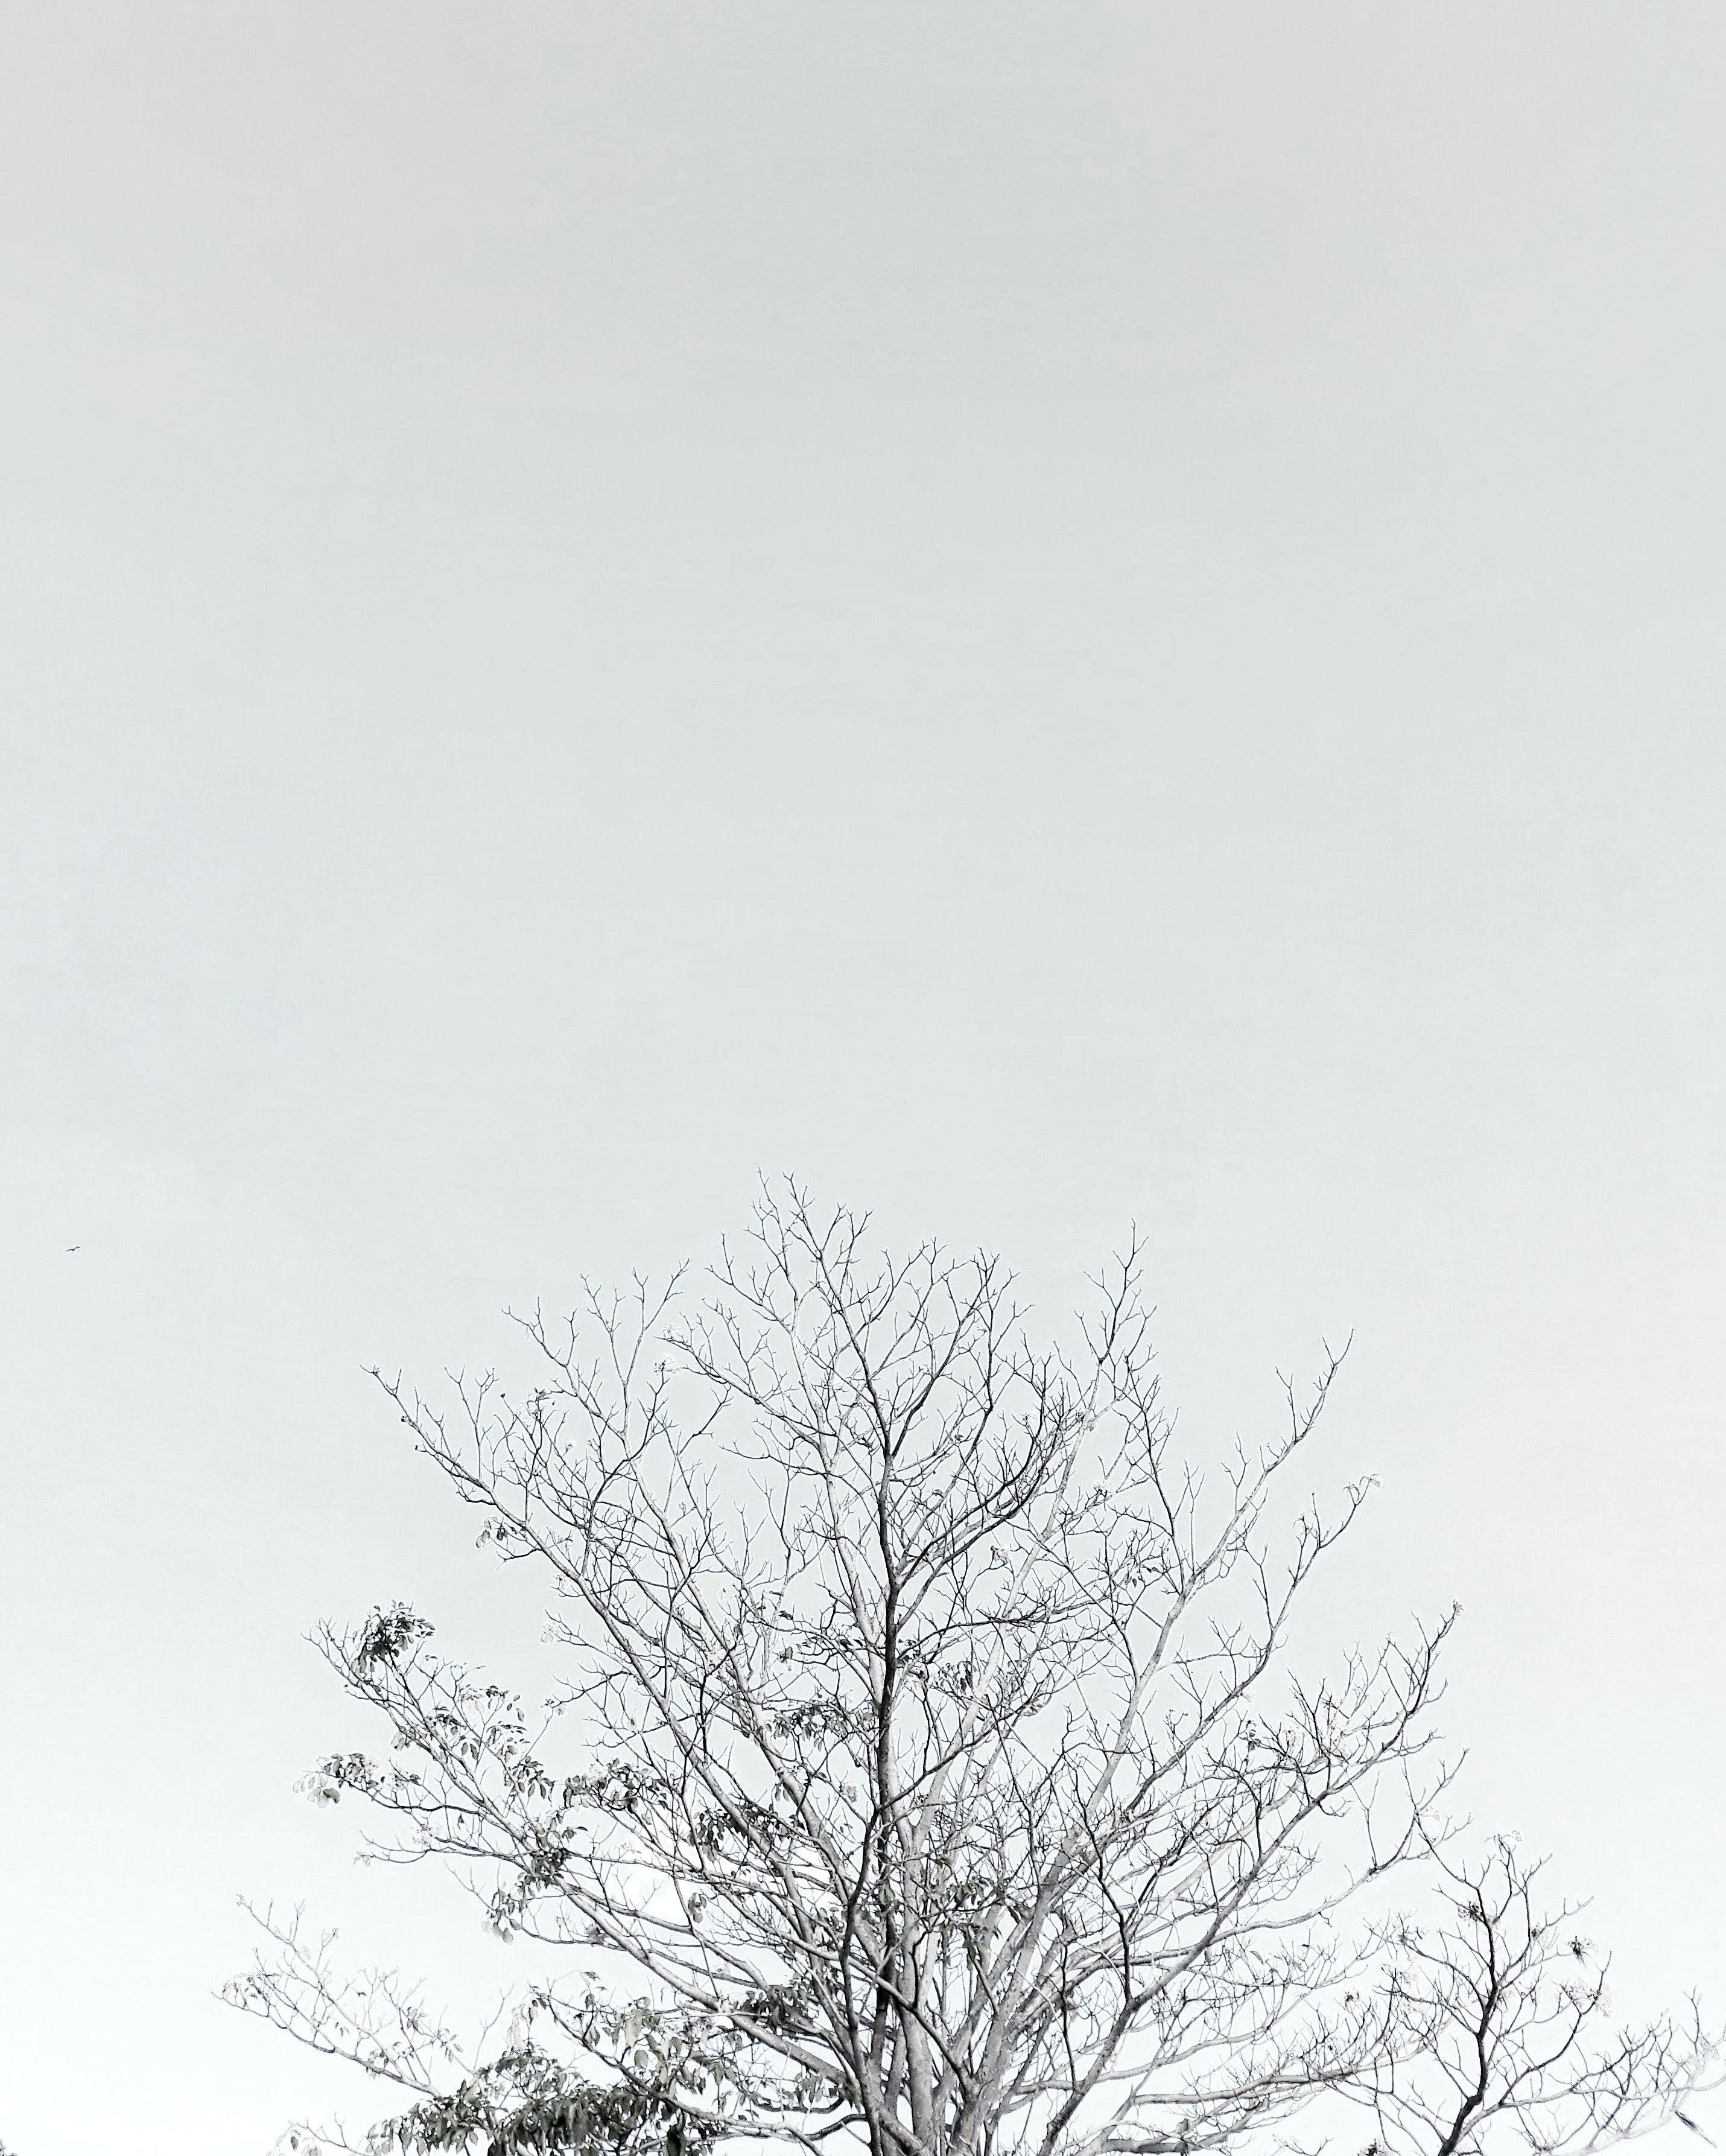 Foto Stok Gratis Tentang Background Hitam Hitam Putih Latar Belakang Hitam